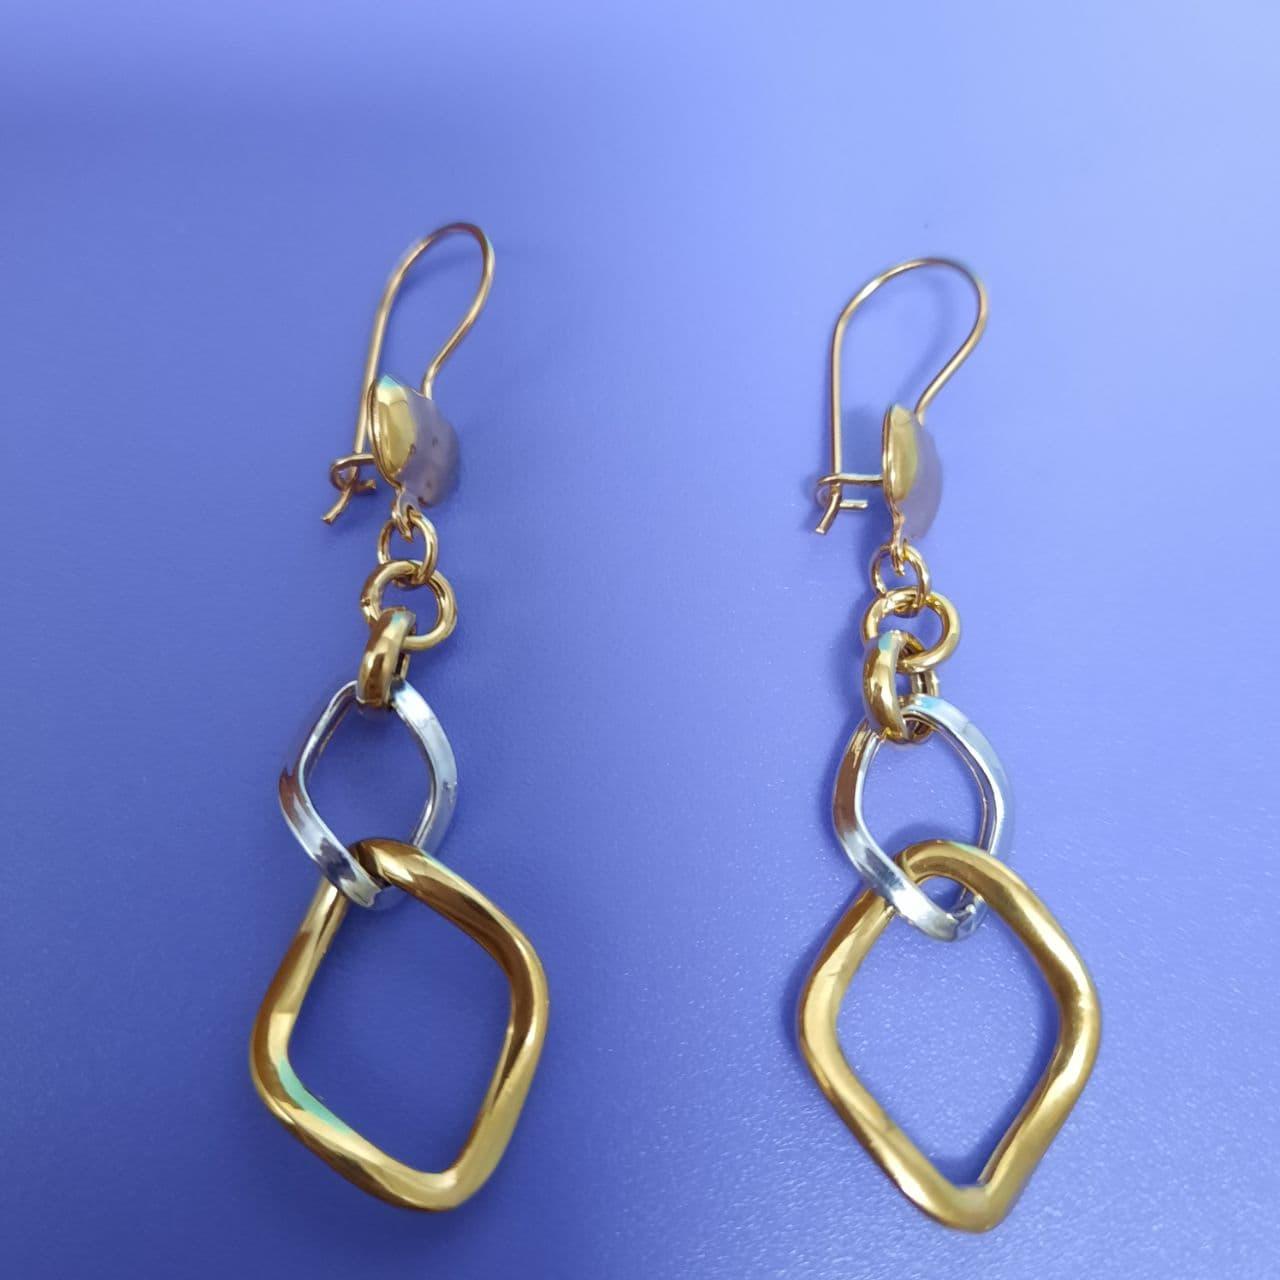 گوشواره طلا 18 عیار زنانه  گالری یارطلا کد AG04